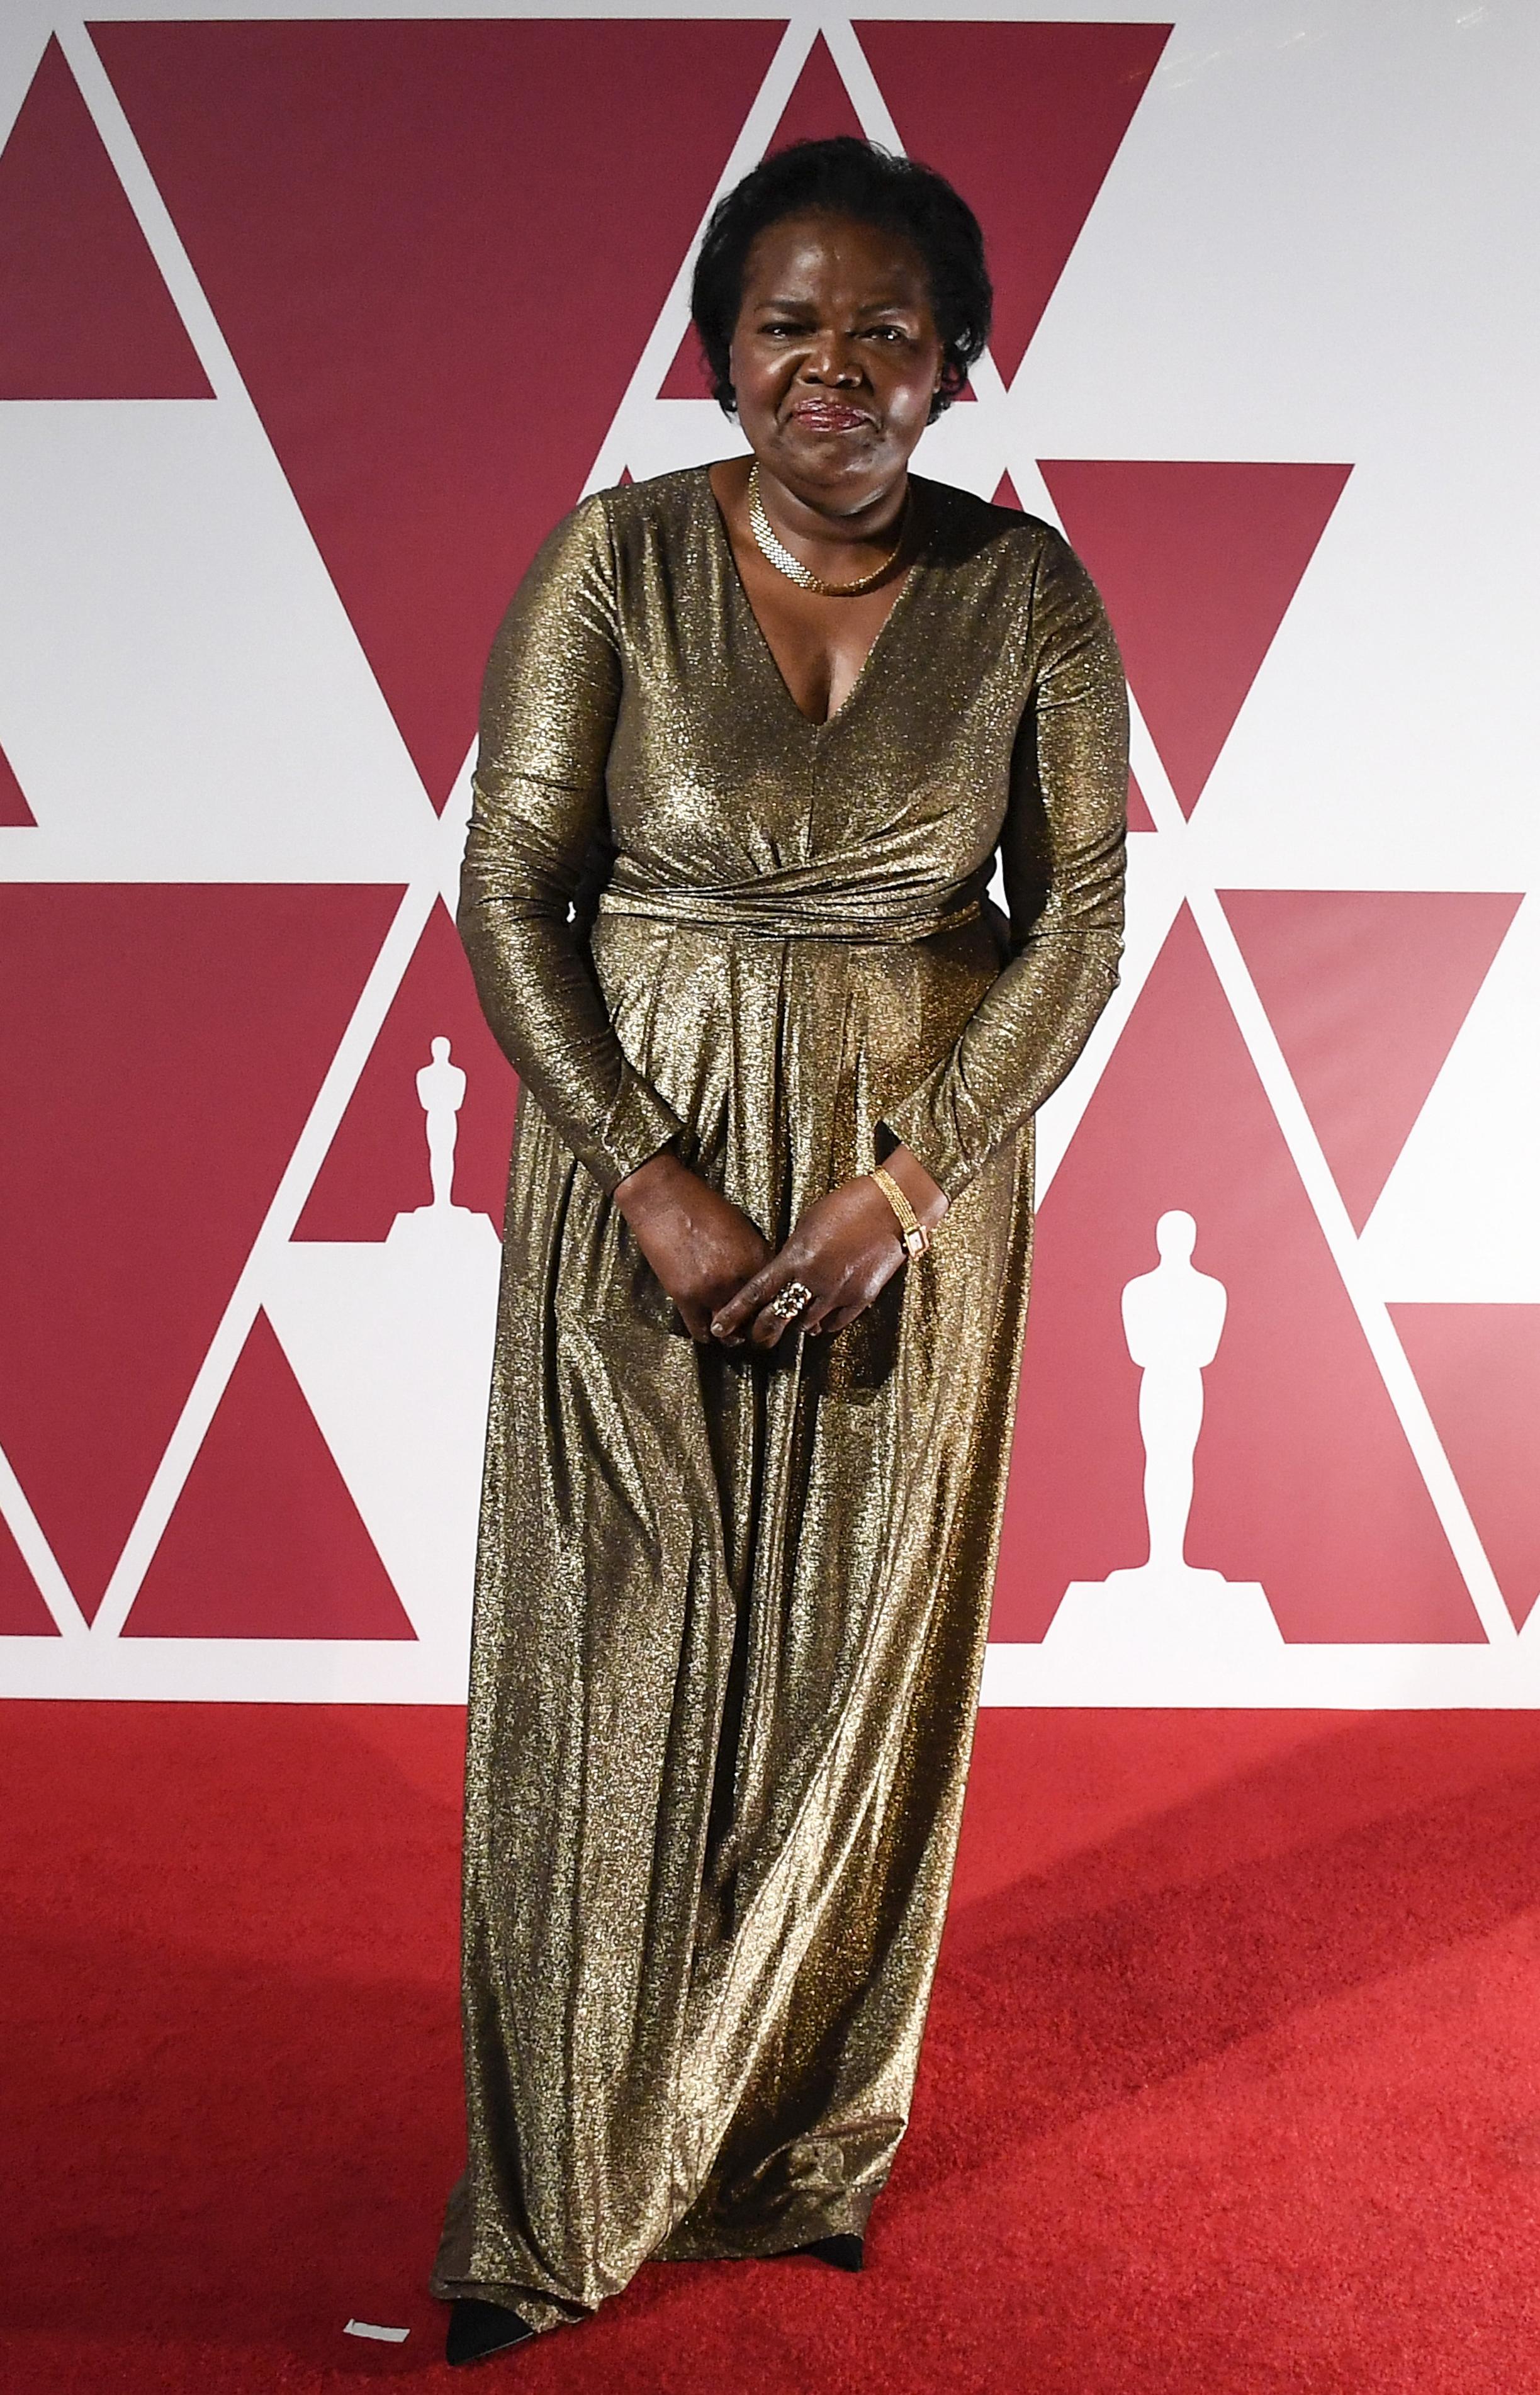 Damalie Namusoke, mother of Oscar nominee British actor Daniel Kaluuya, arrives for a screening of the Oscars on April 25, 2021 in London. AFP PHOTO